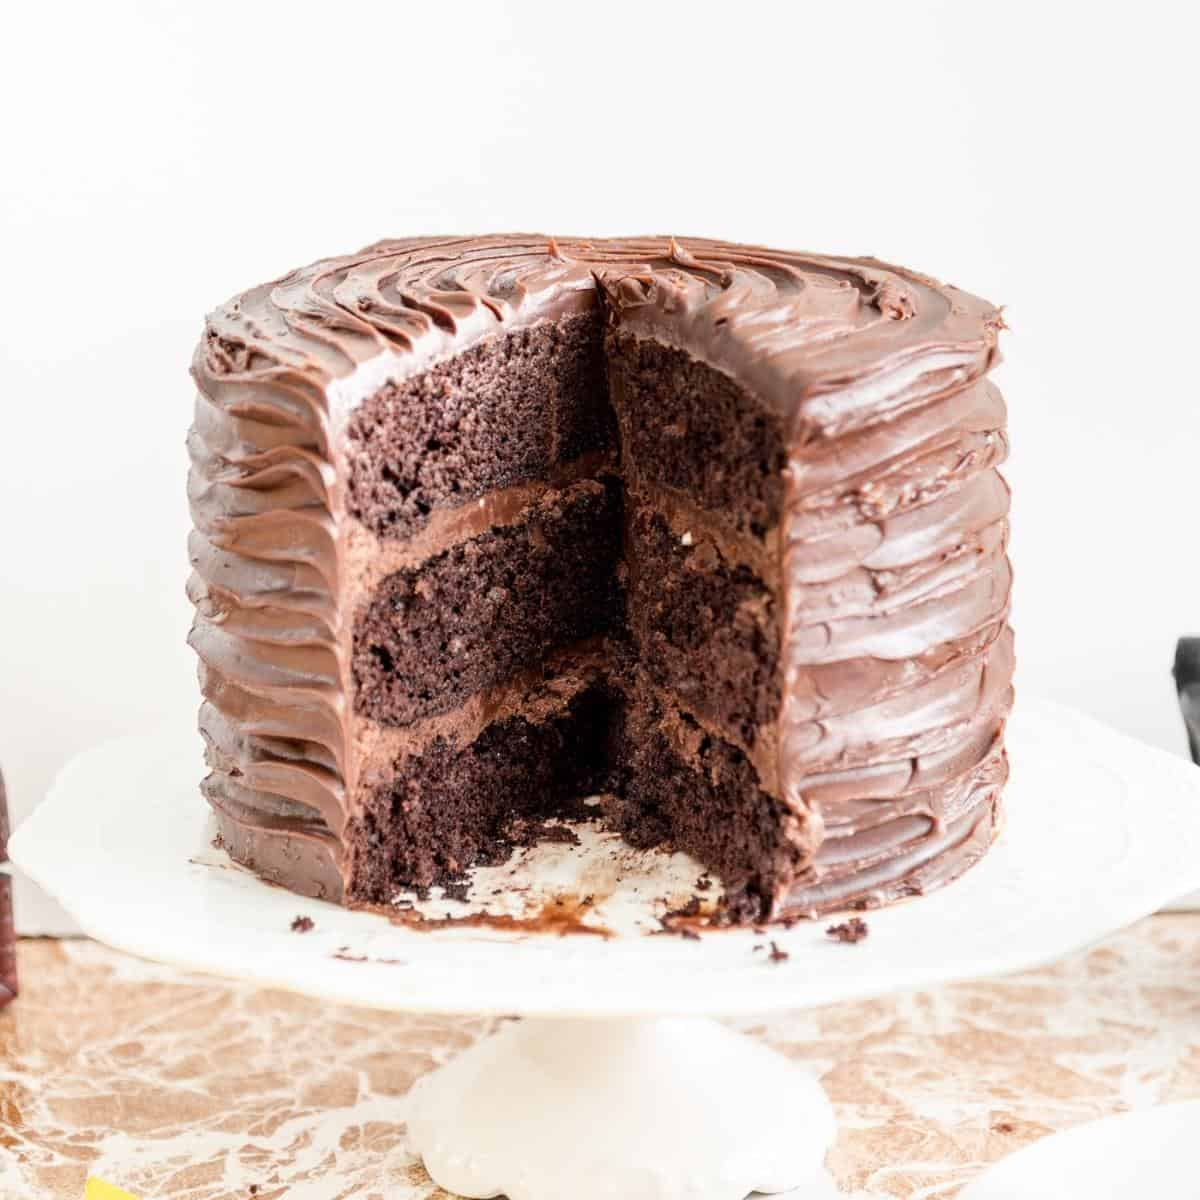 A sliced chocolate cake on cake stand.